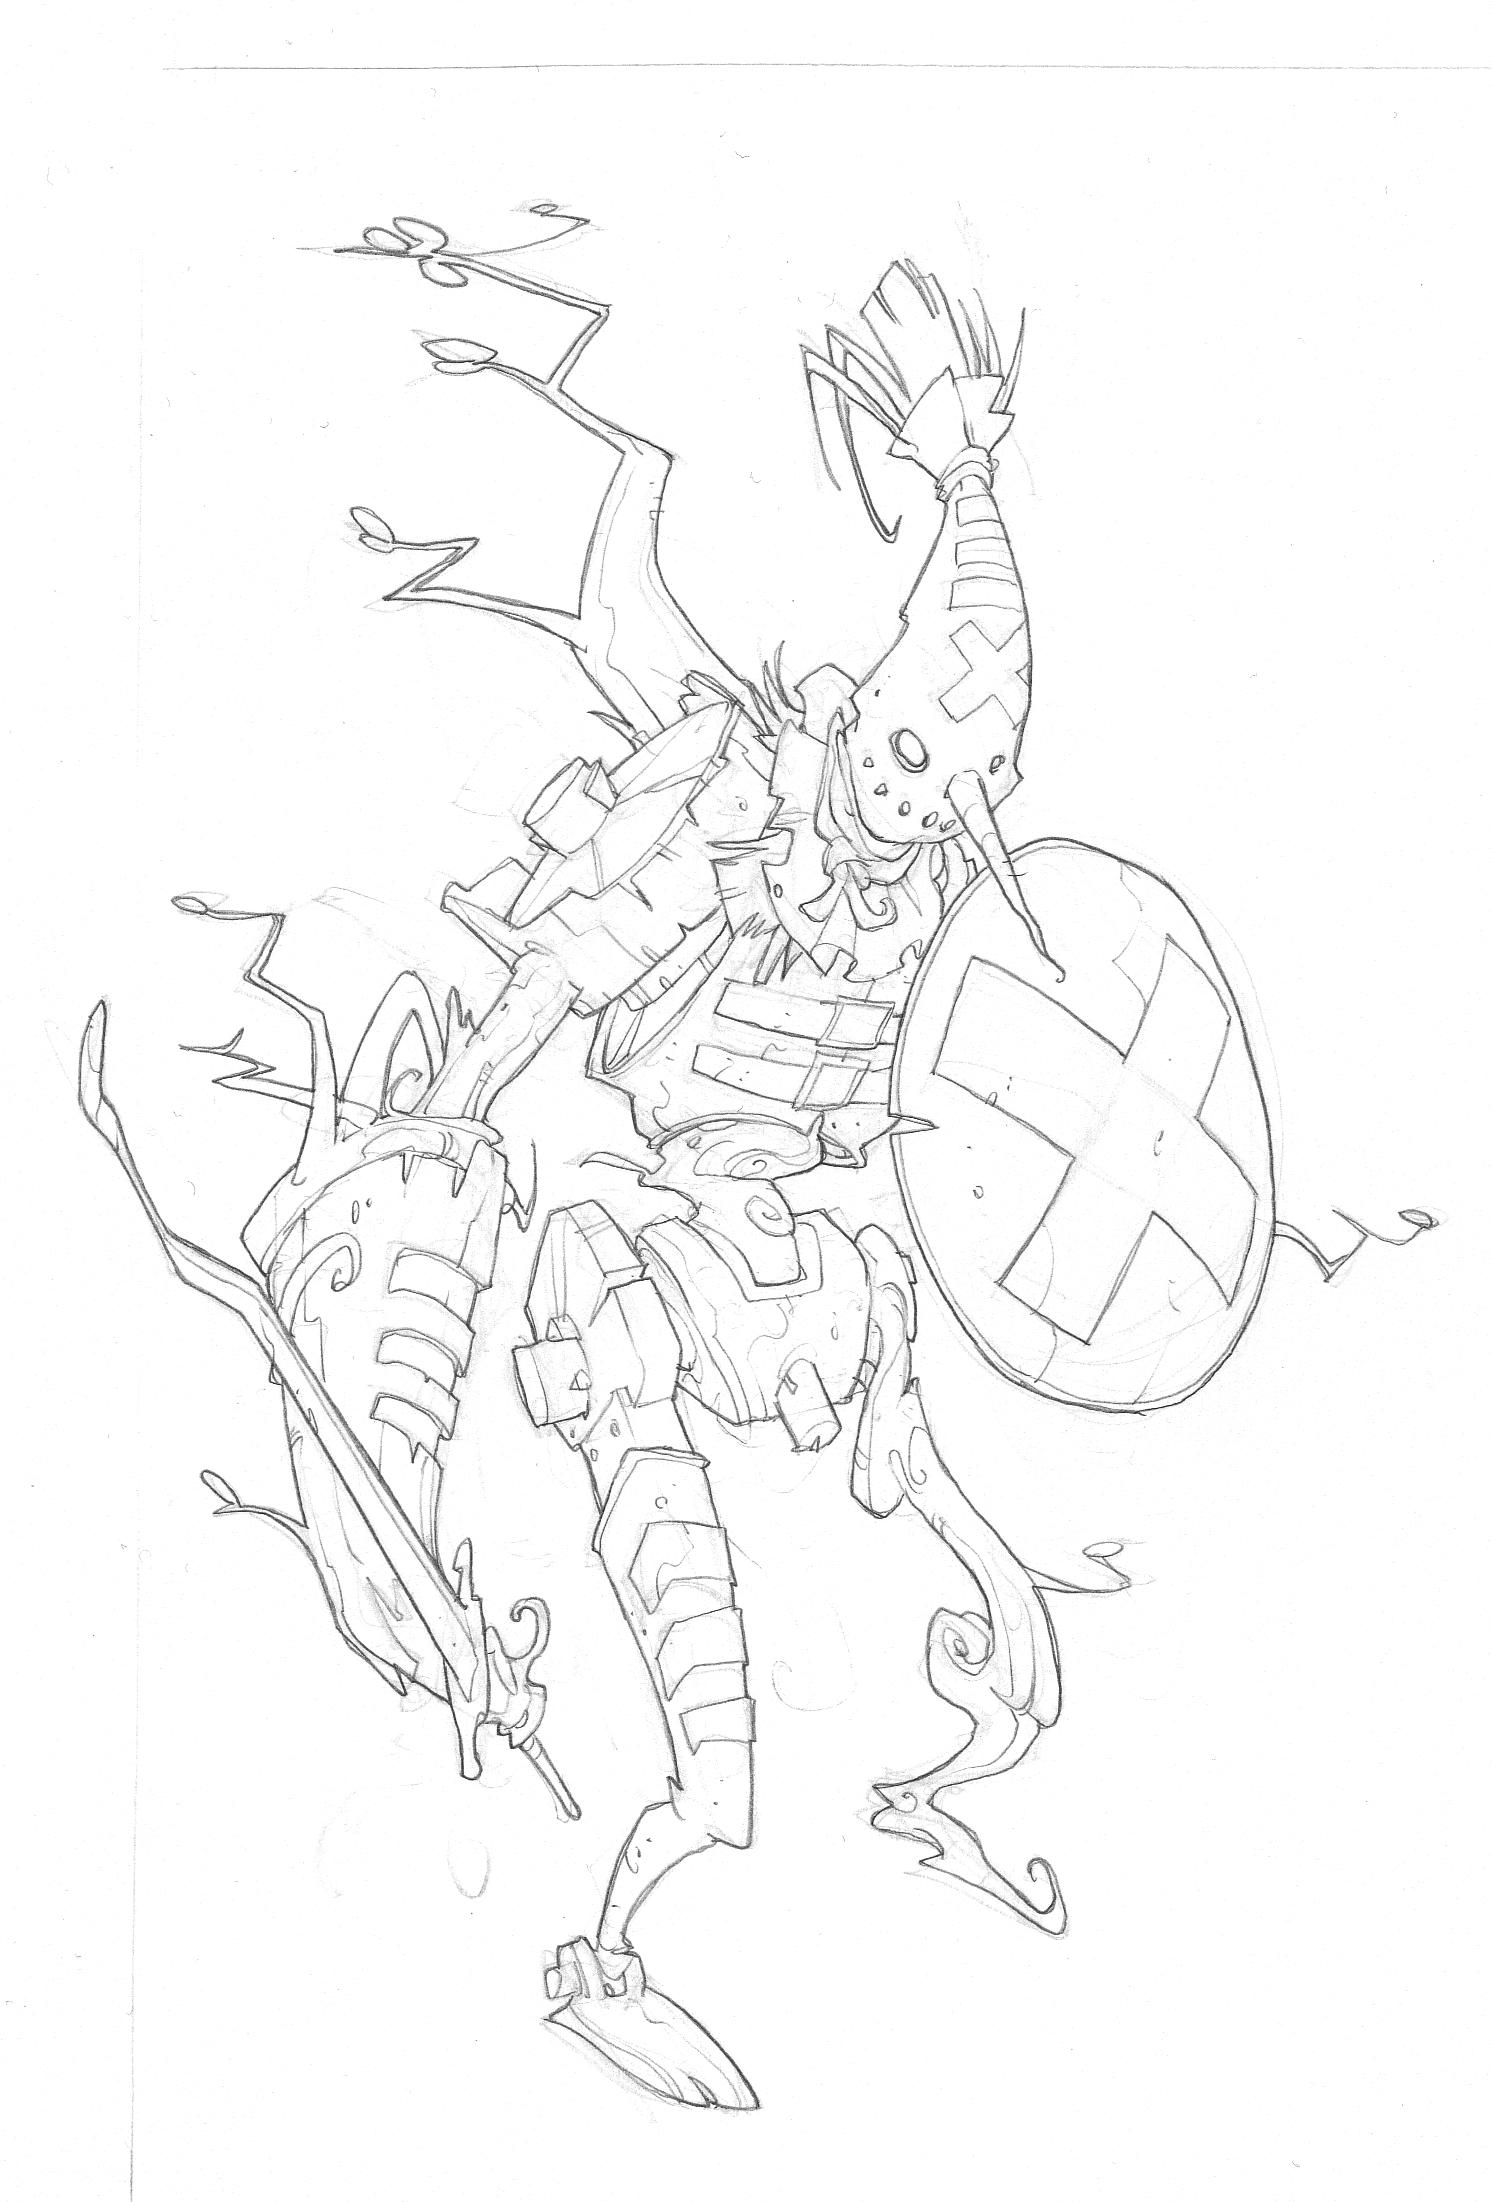 mercenary_warrior_8.jpg